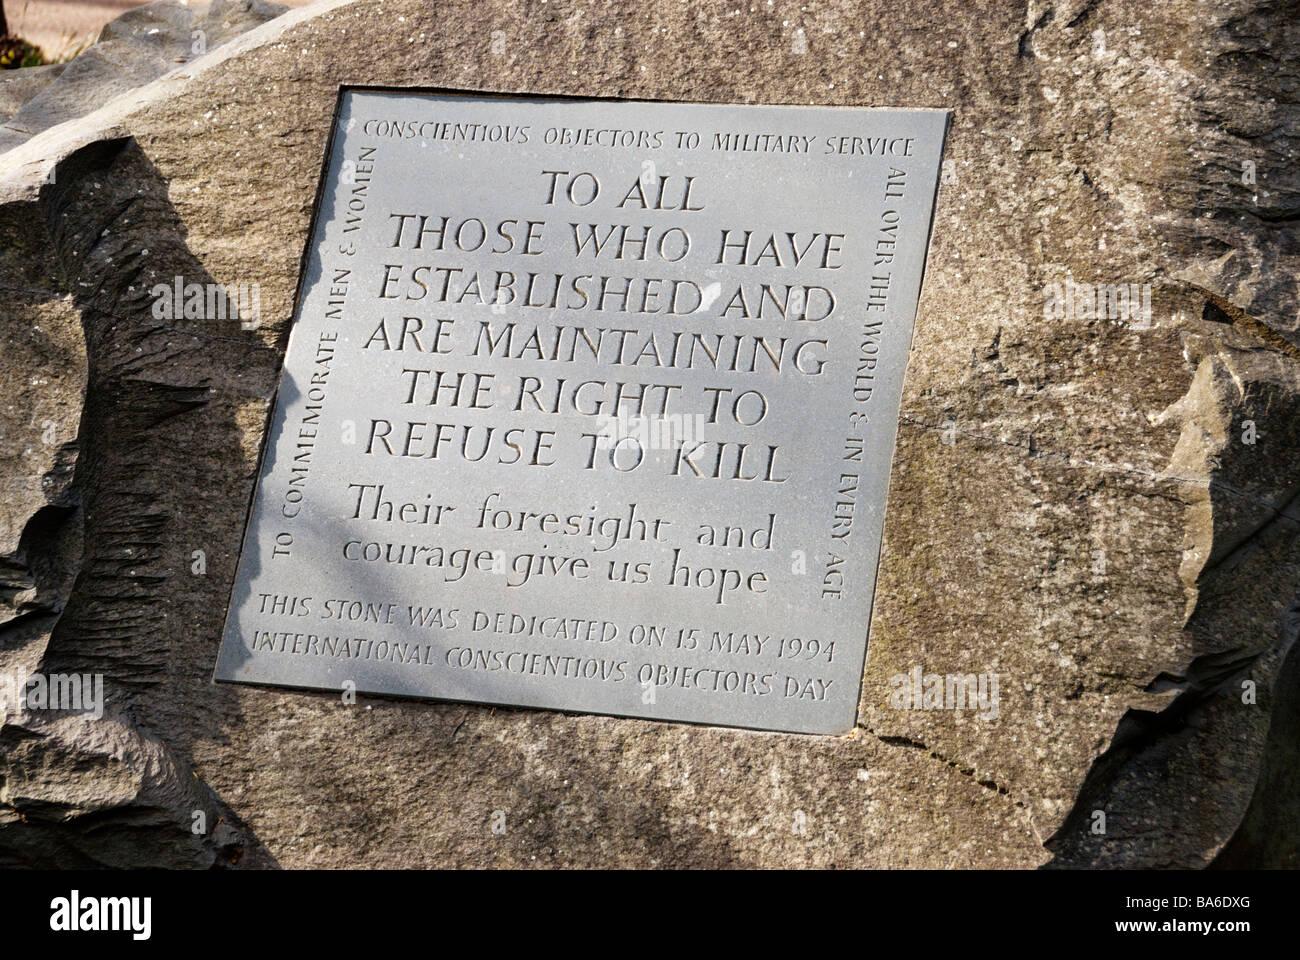 Conscientious Objector memorial plaque on stone in Tavistock Square London. Stock Photo